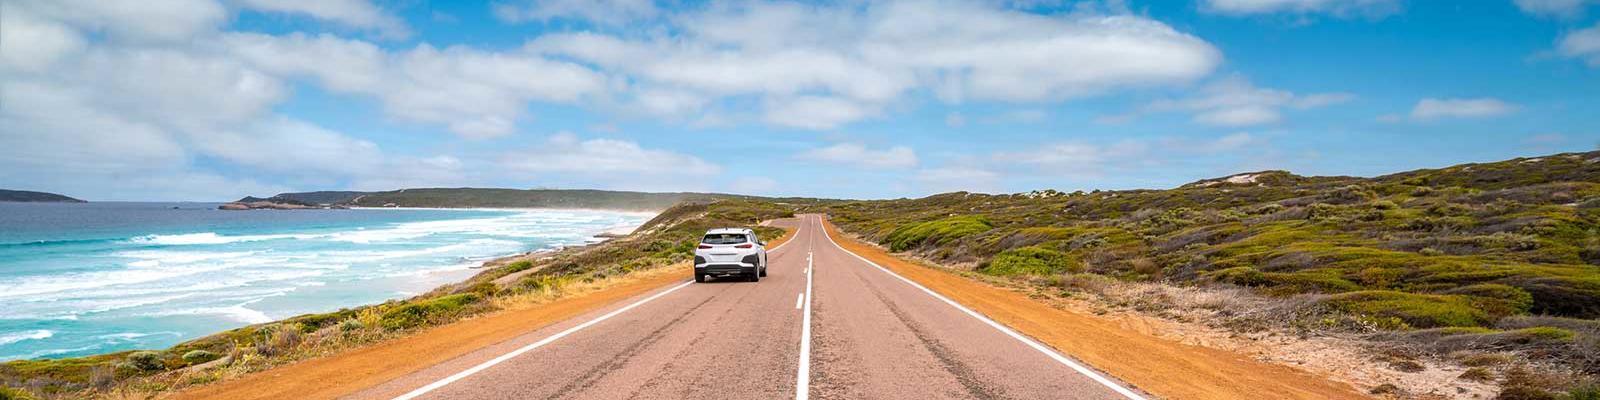 road trip australia coastline